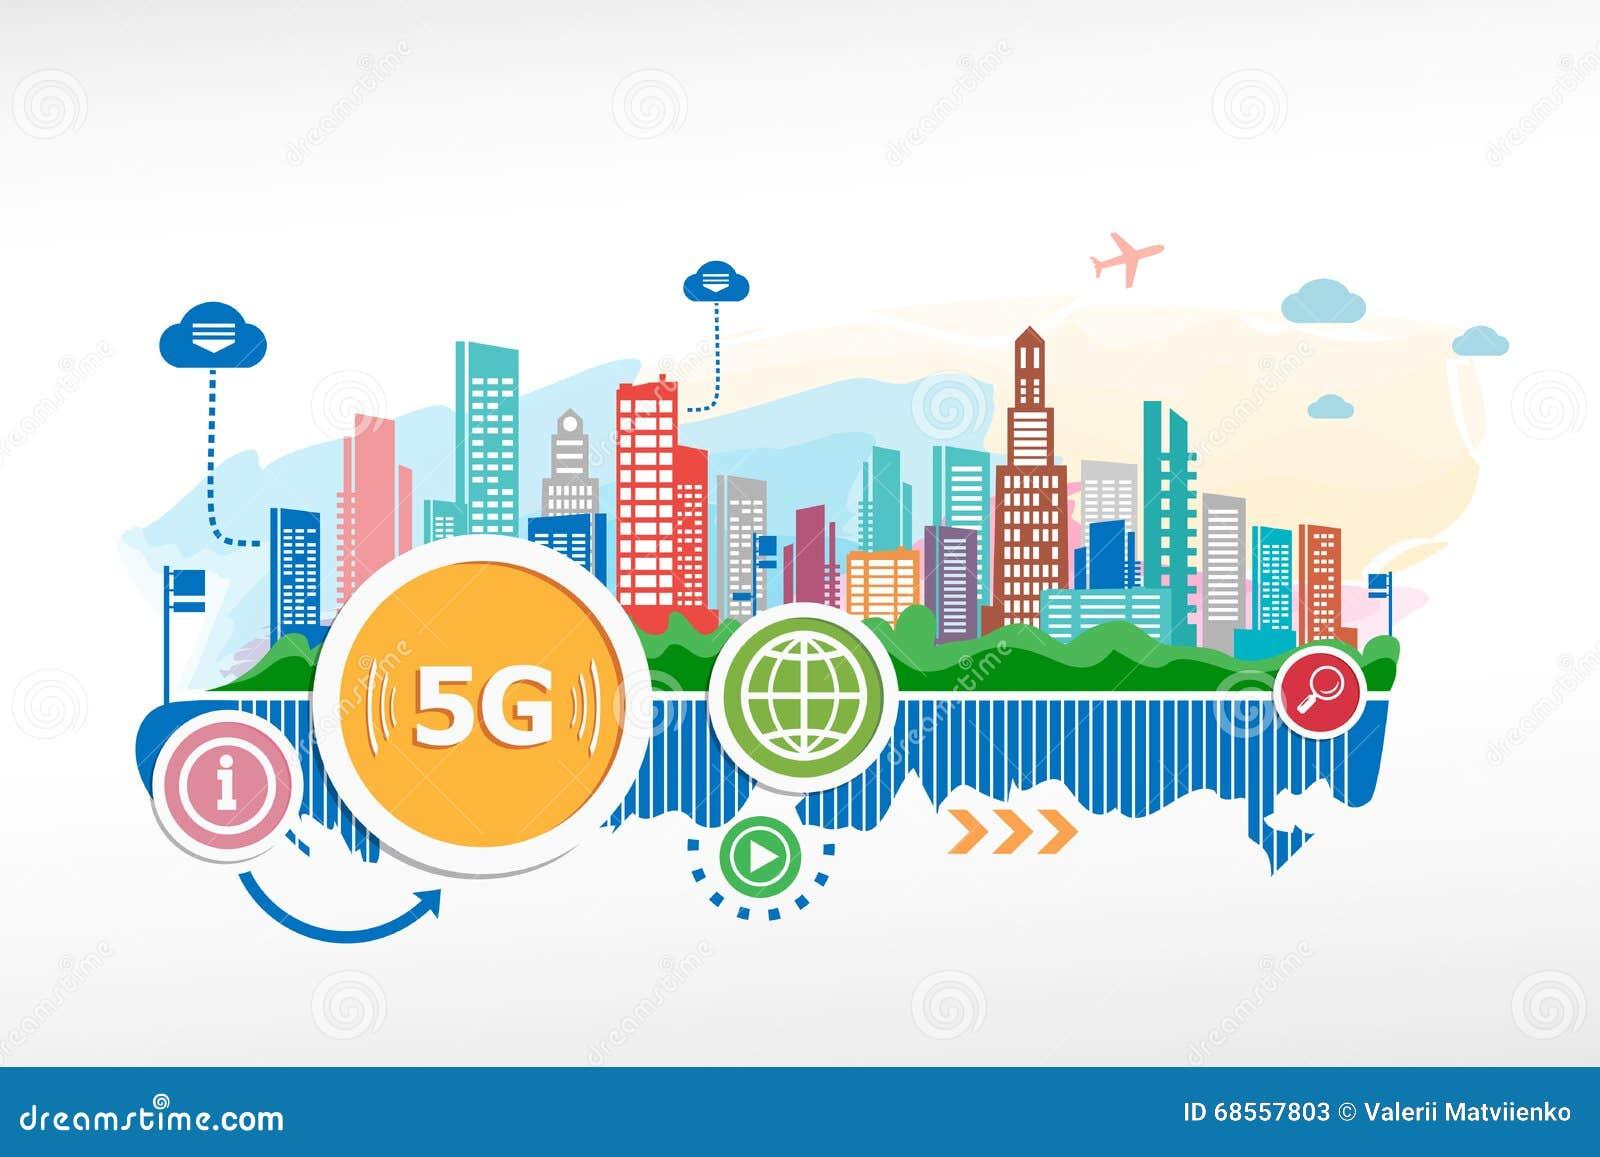 5G tekenpictogram Mobiel telecommunicatietechnologieteken